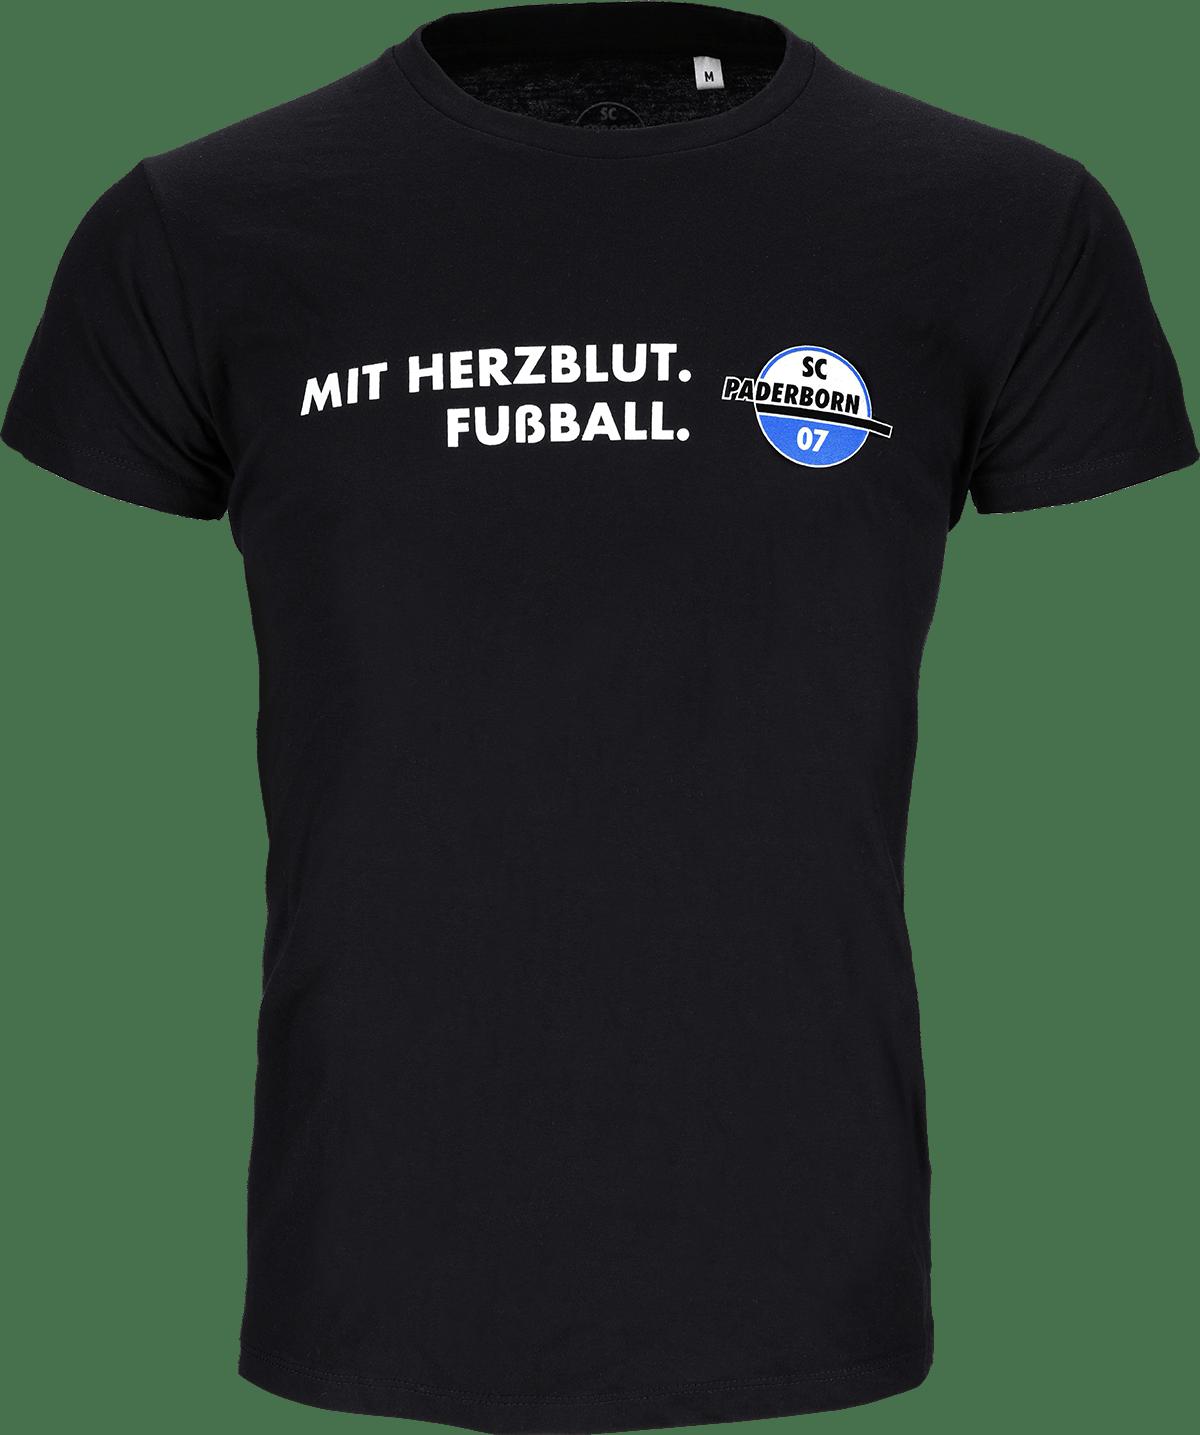 T-Shirt Herzblut